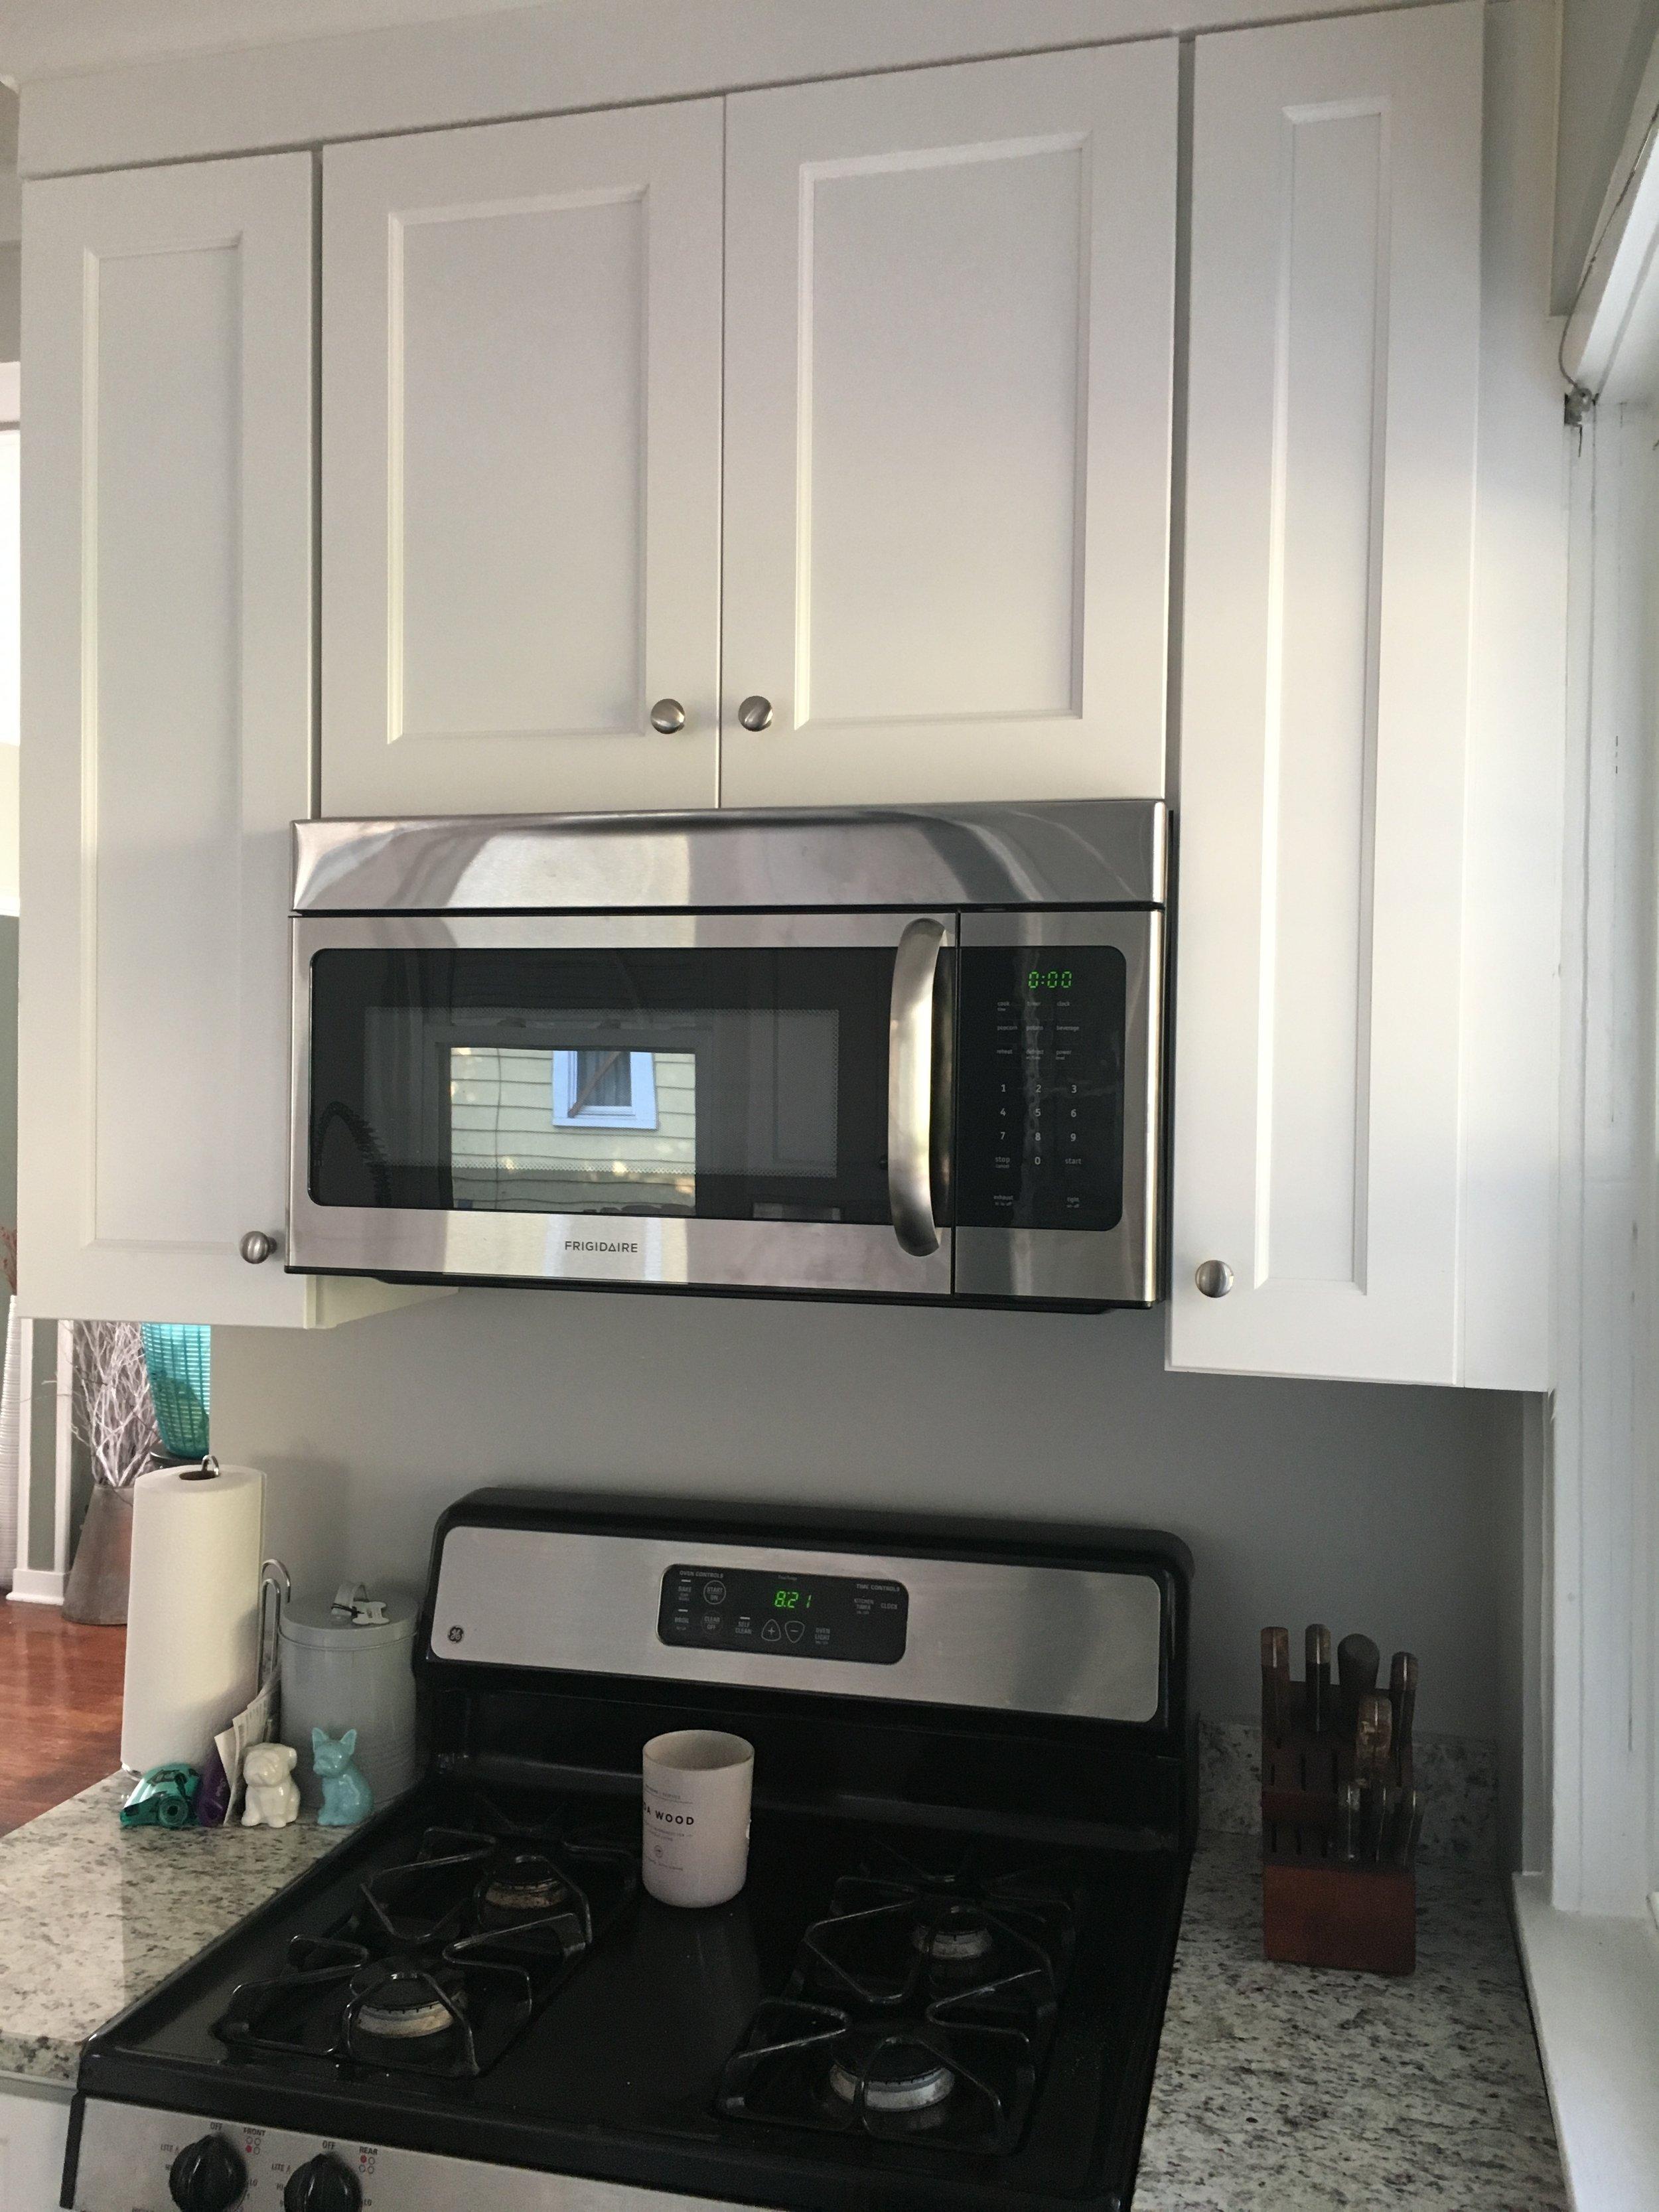 mt-vernon-stove.JPG